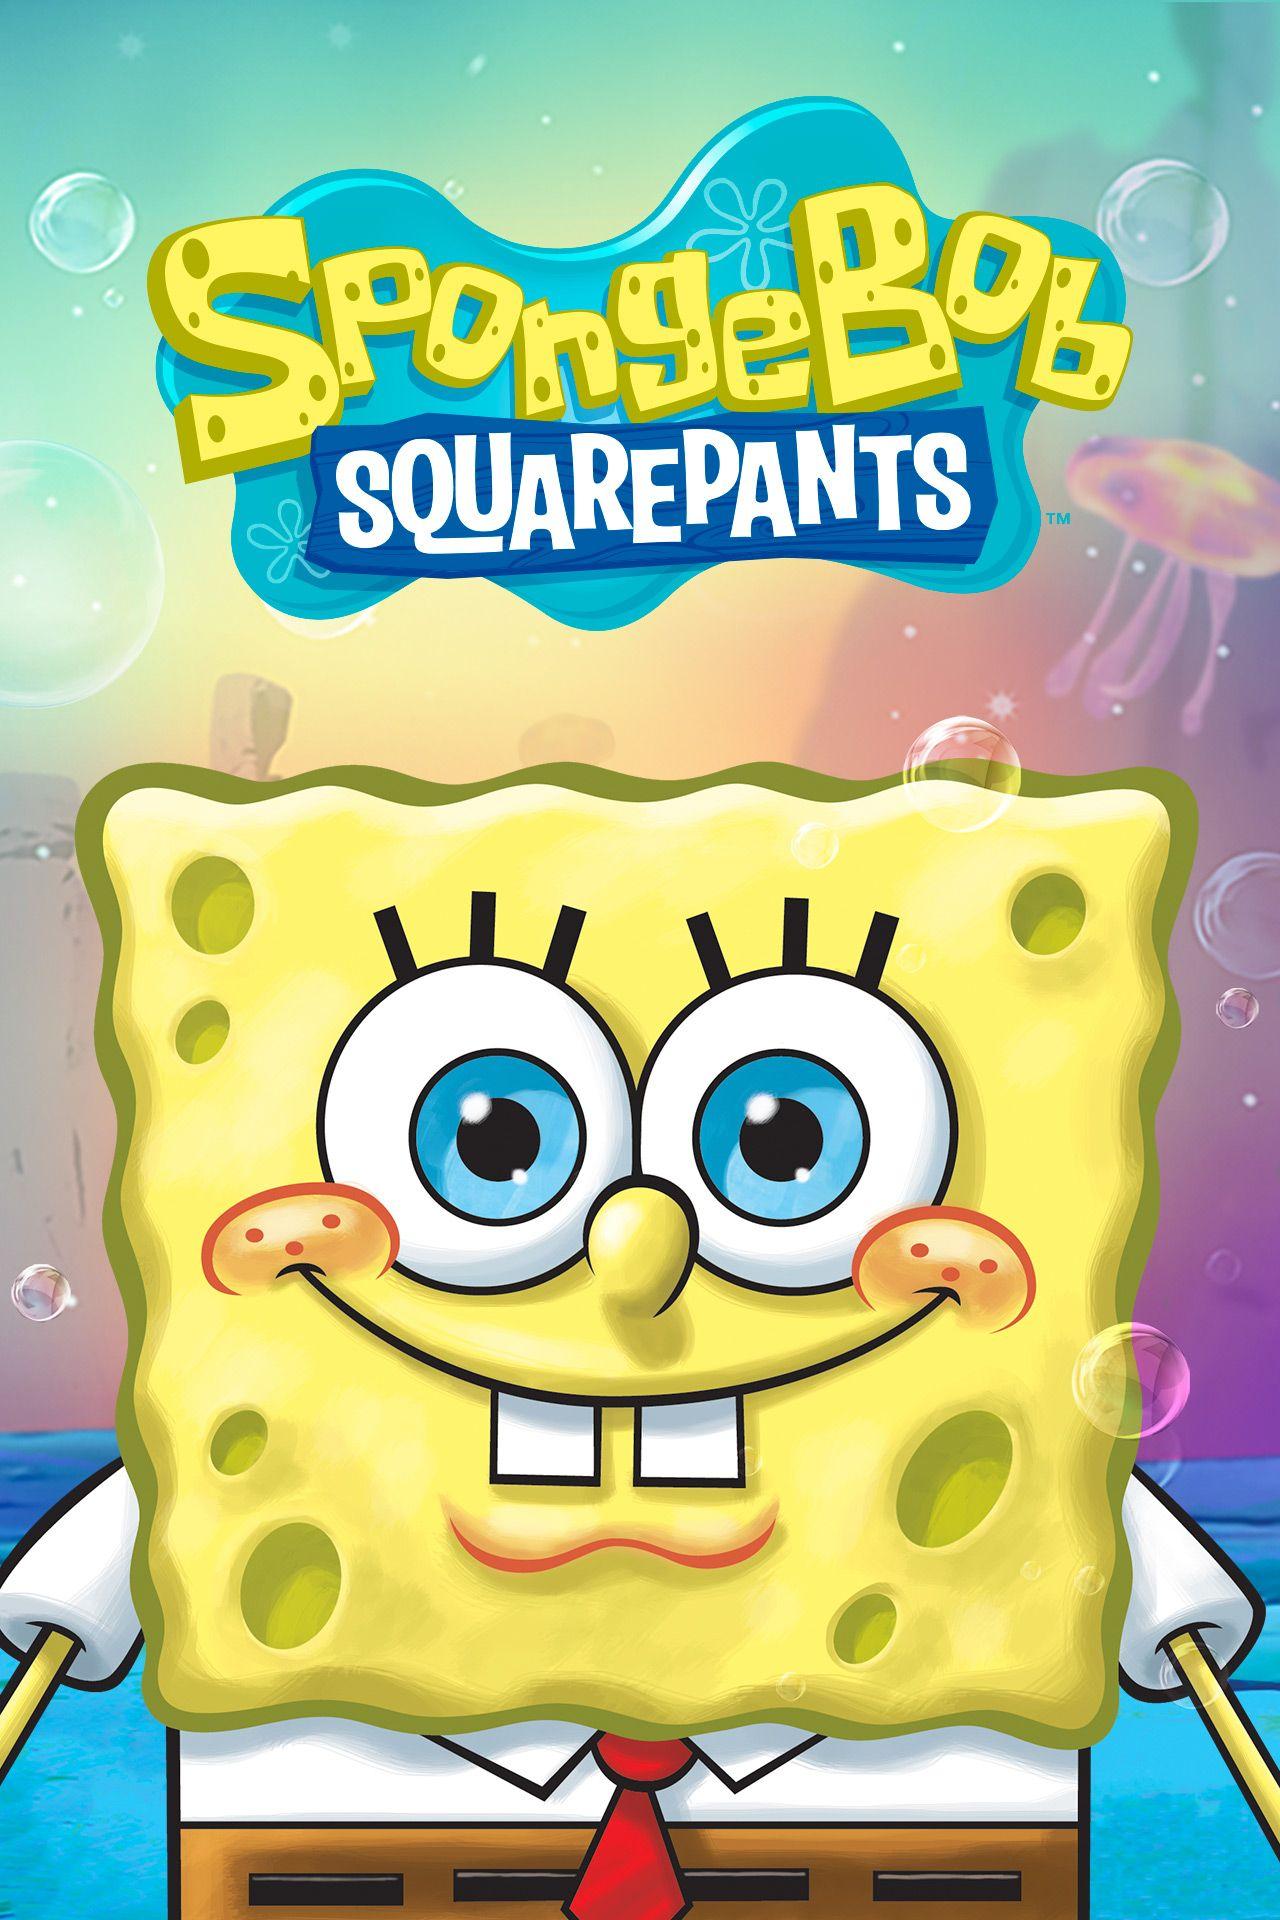 Image result for spongebob squarepants